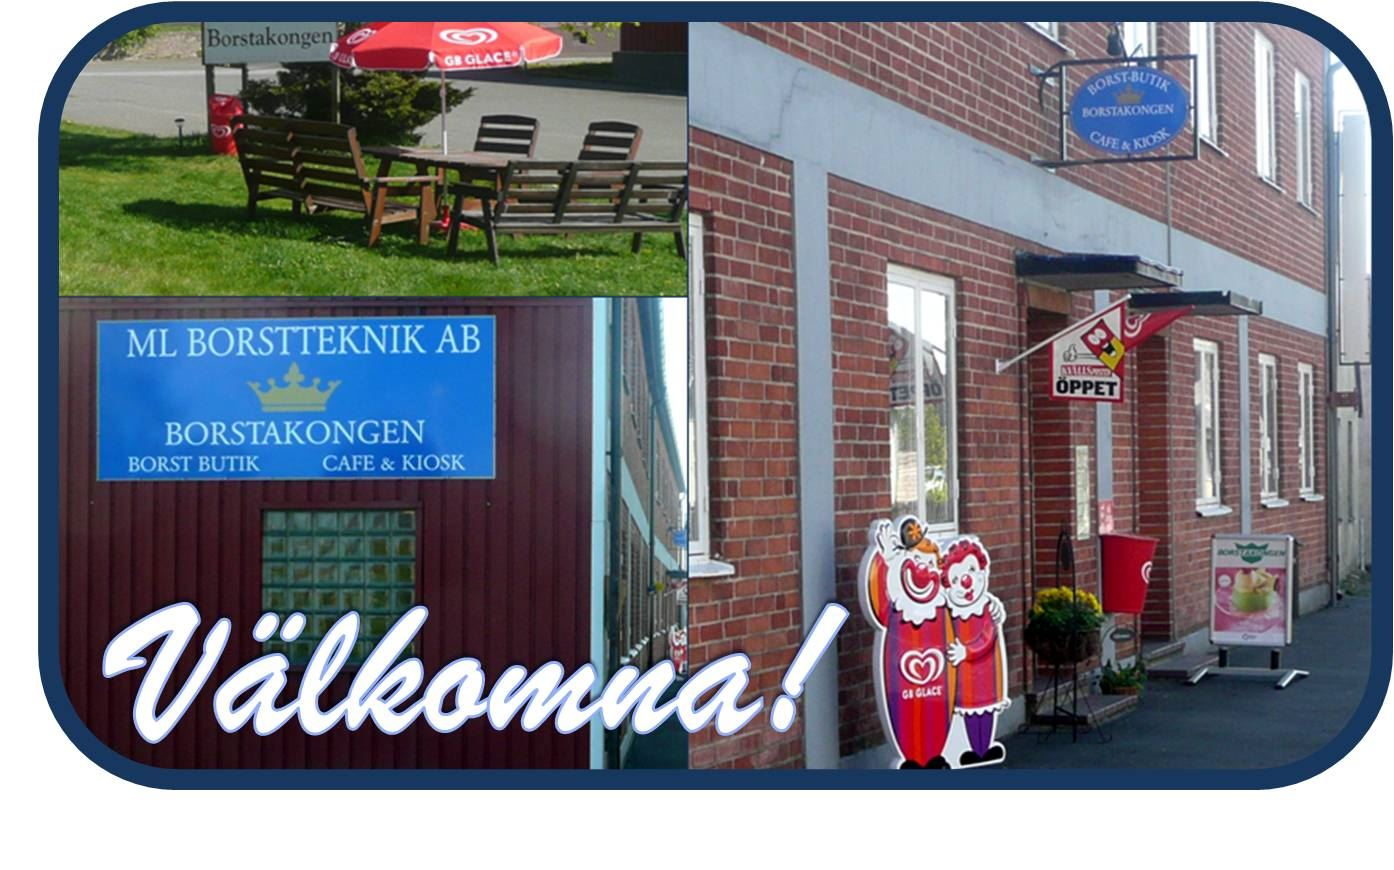 20års jubileum på Borstakongen Borstbutik & Café